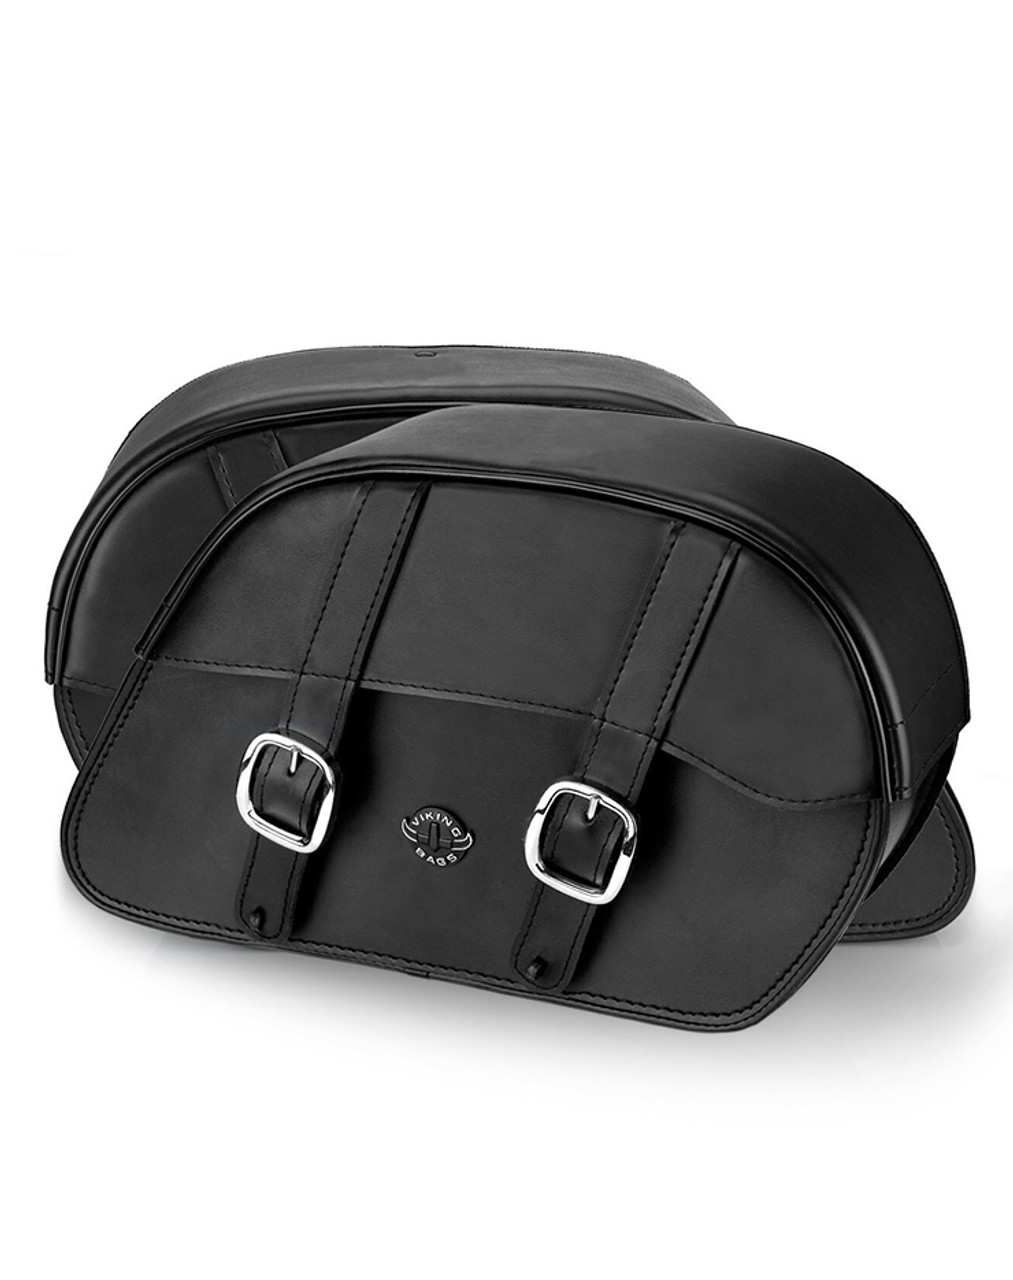 Victory Vegas Slanted Medium Motorcycle Saddlebags Both Bags View